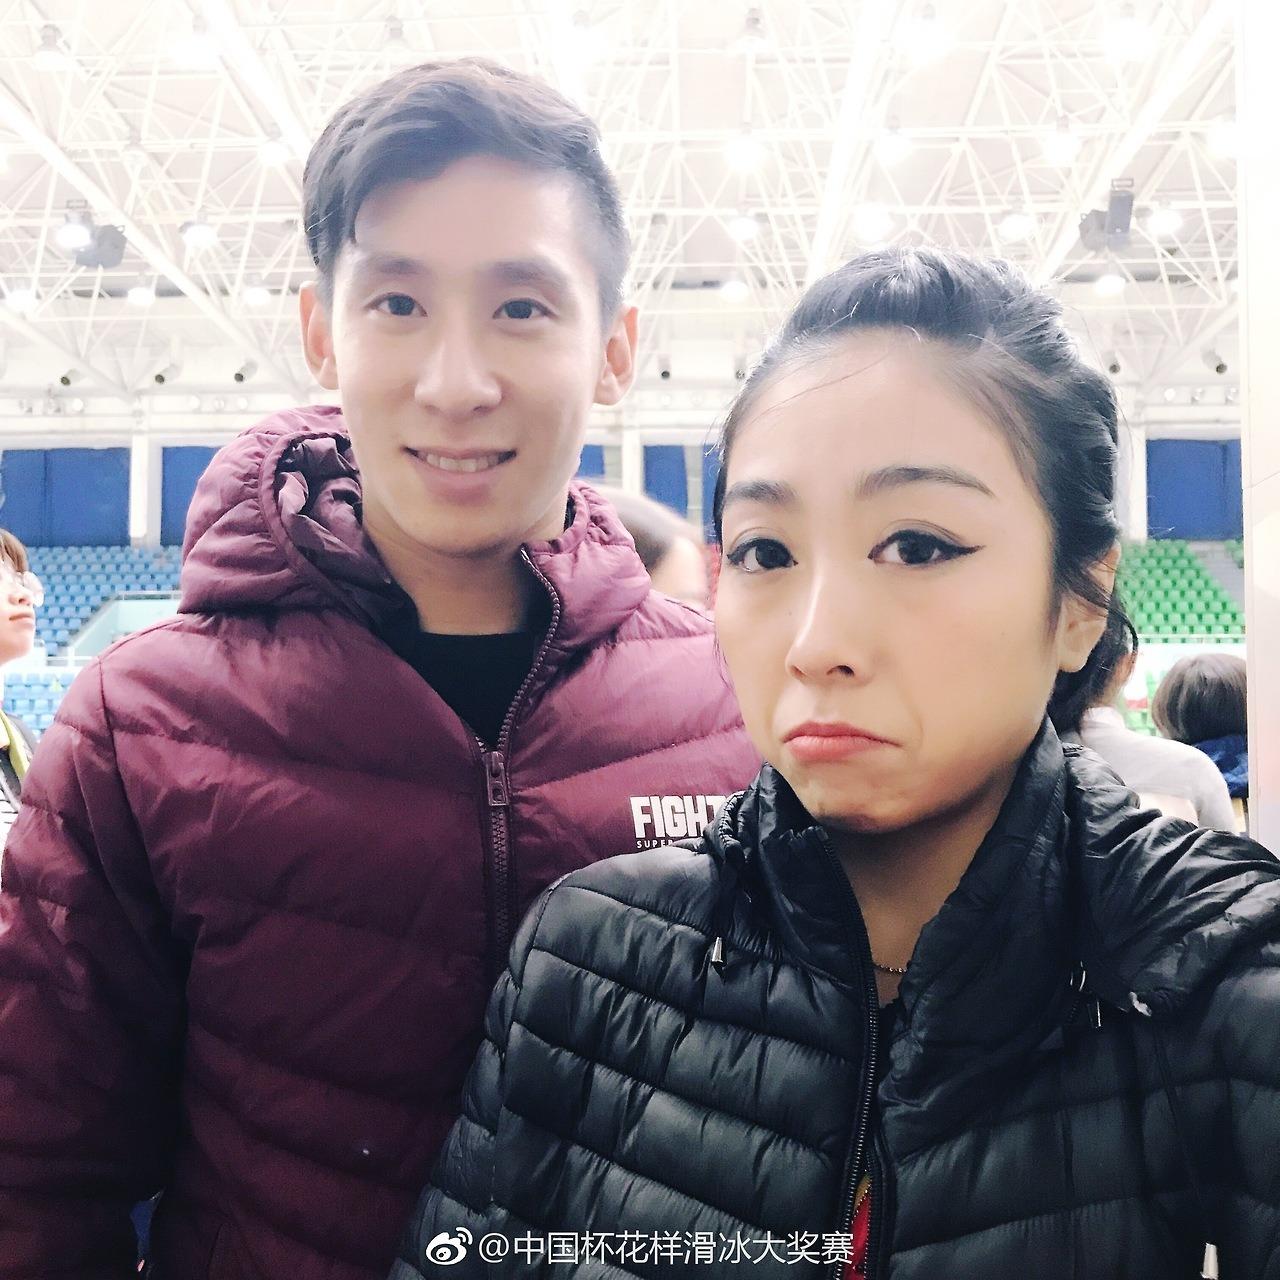 Вэньцзин Суй - Цун Хань / Wenjing SUI - Cong HAN CHN - Страница 10 KoYA8